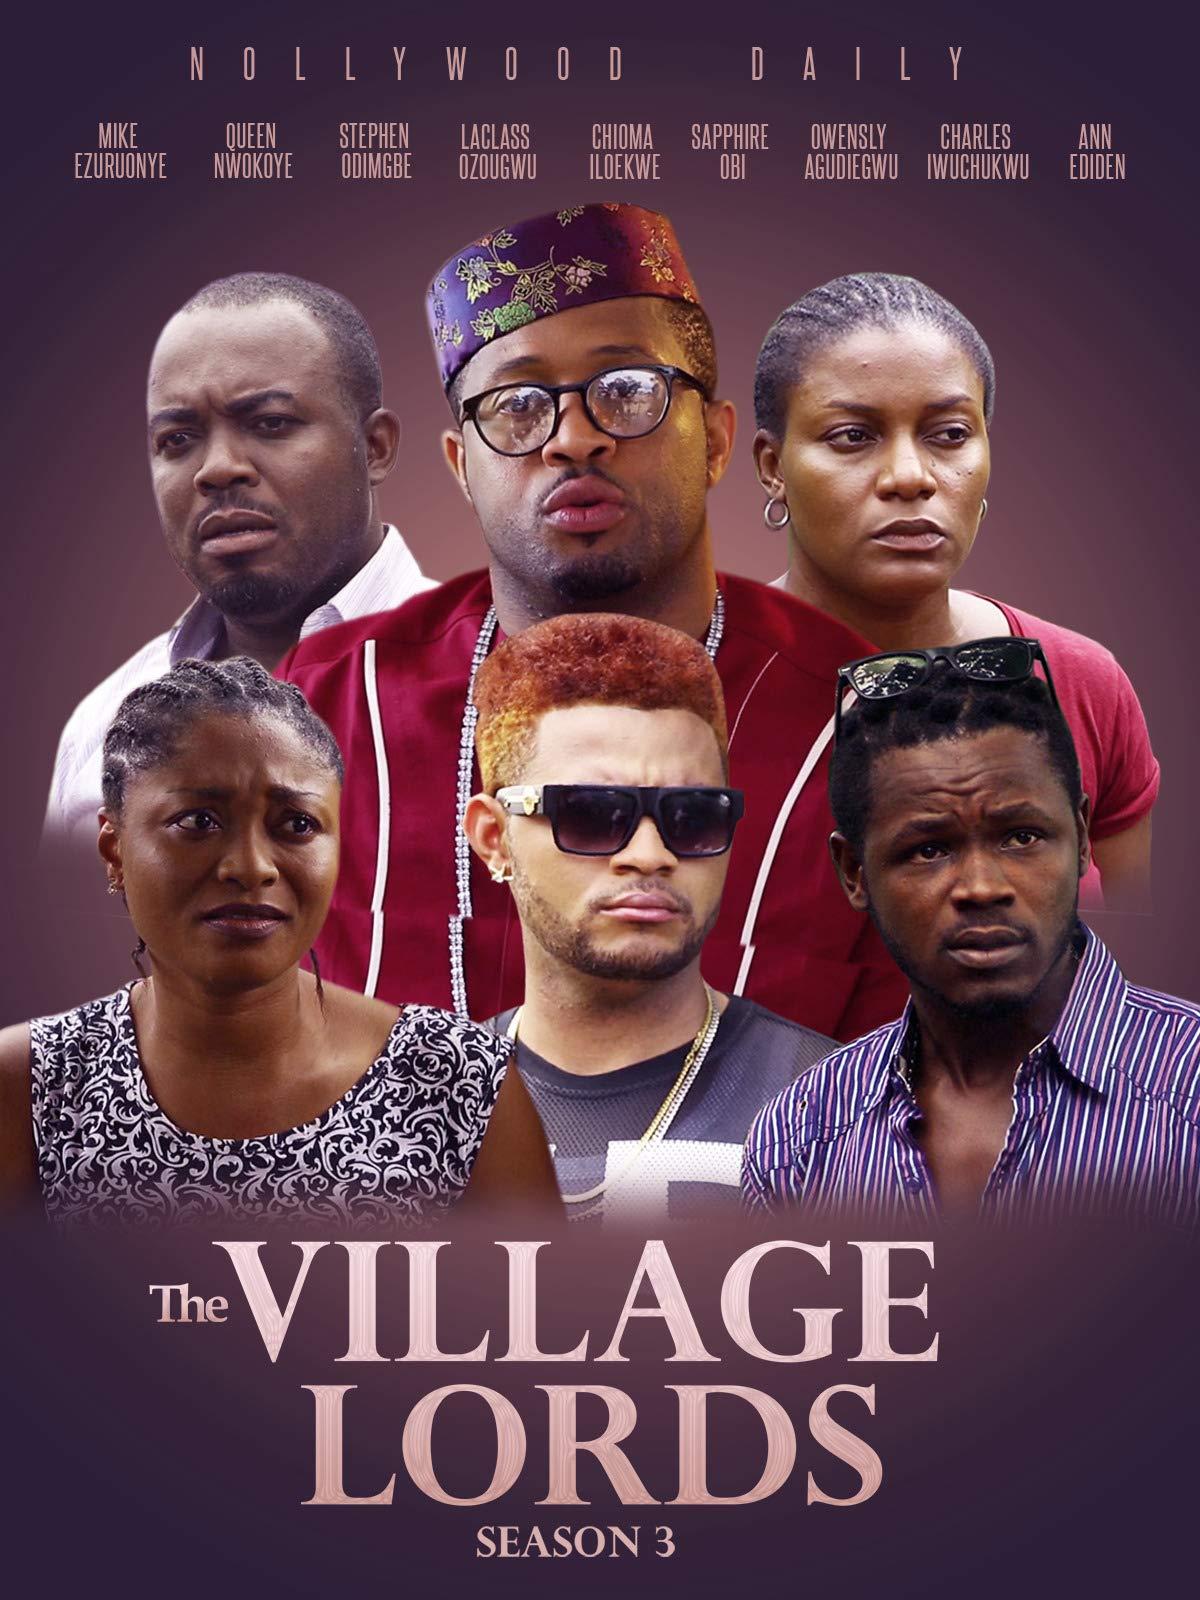 The Village Lord (Season 3)